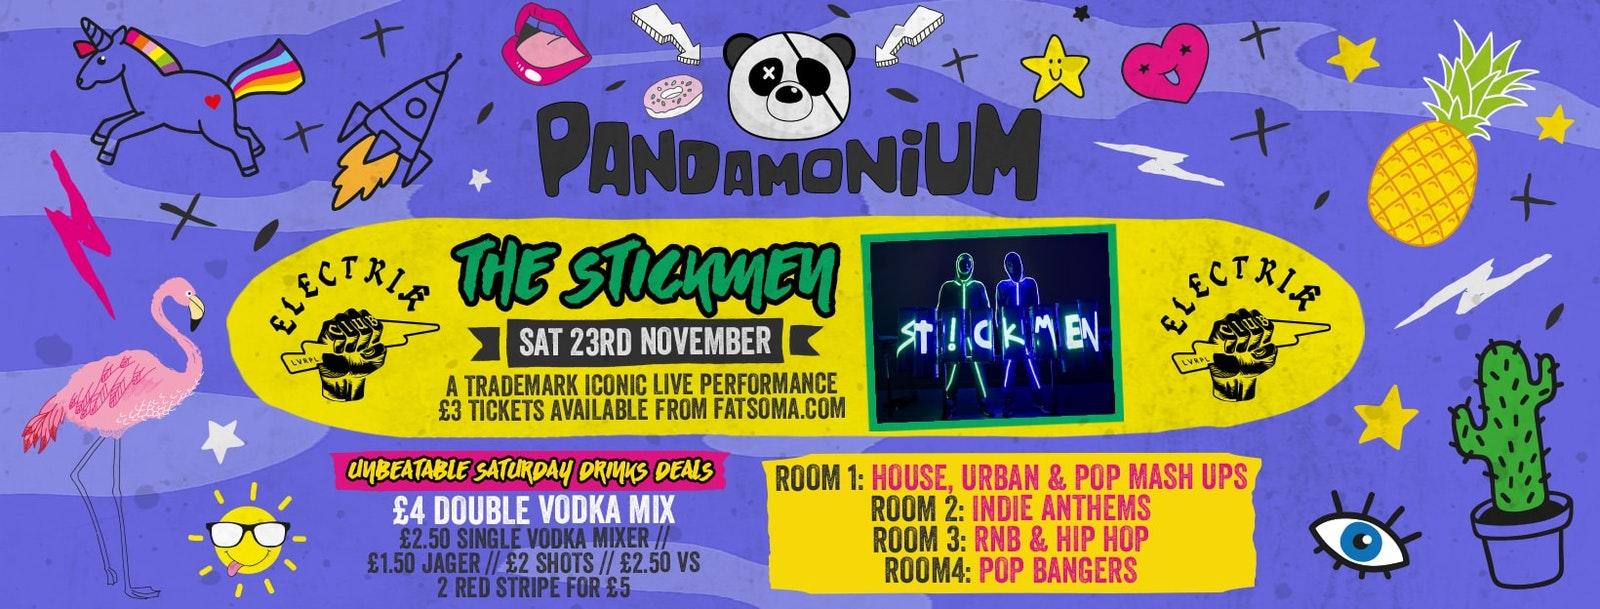 Pandamonium Saturdays presents THE STICKMEN LIVE